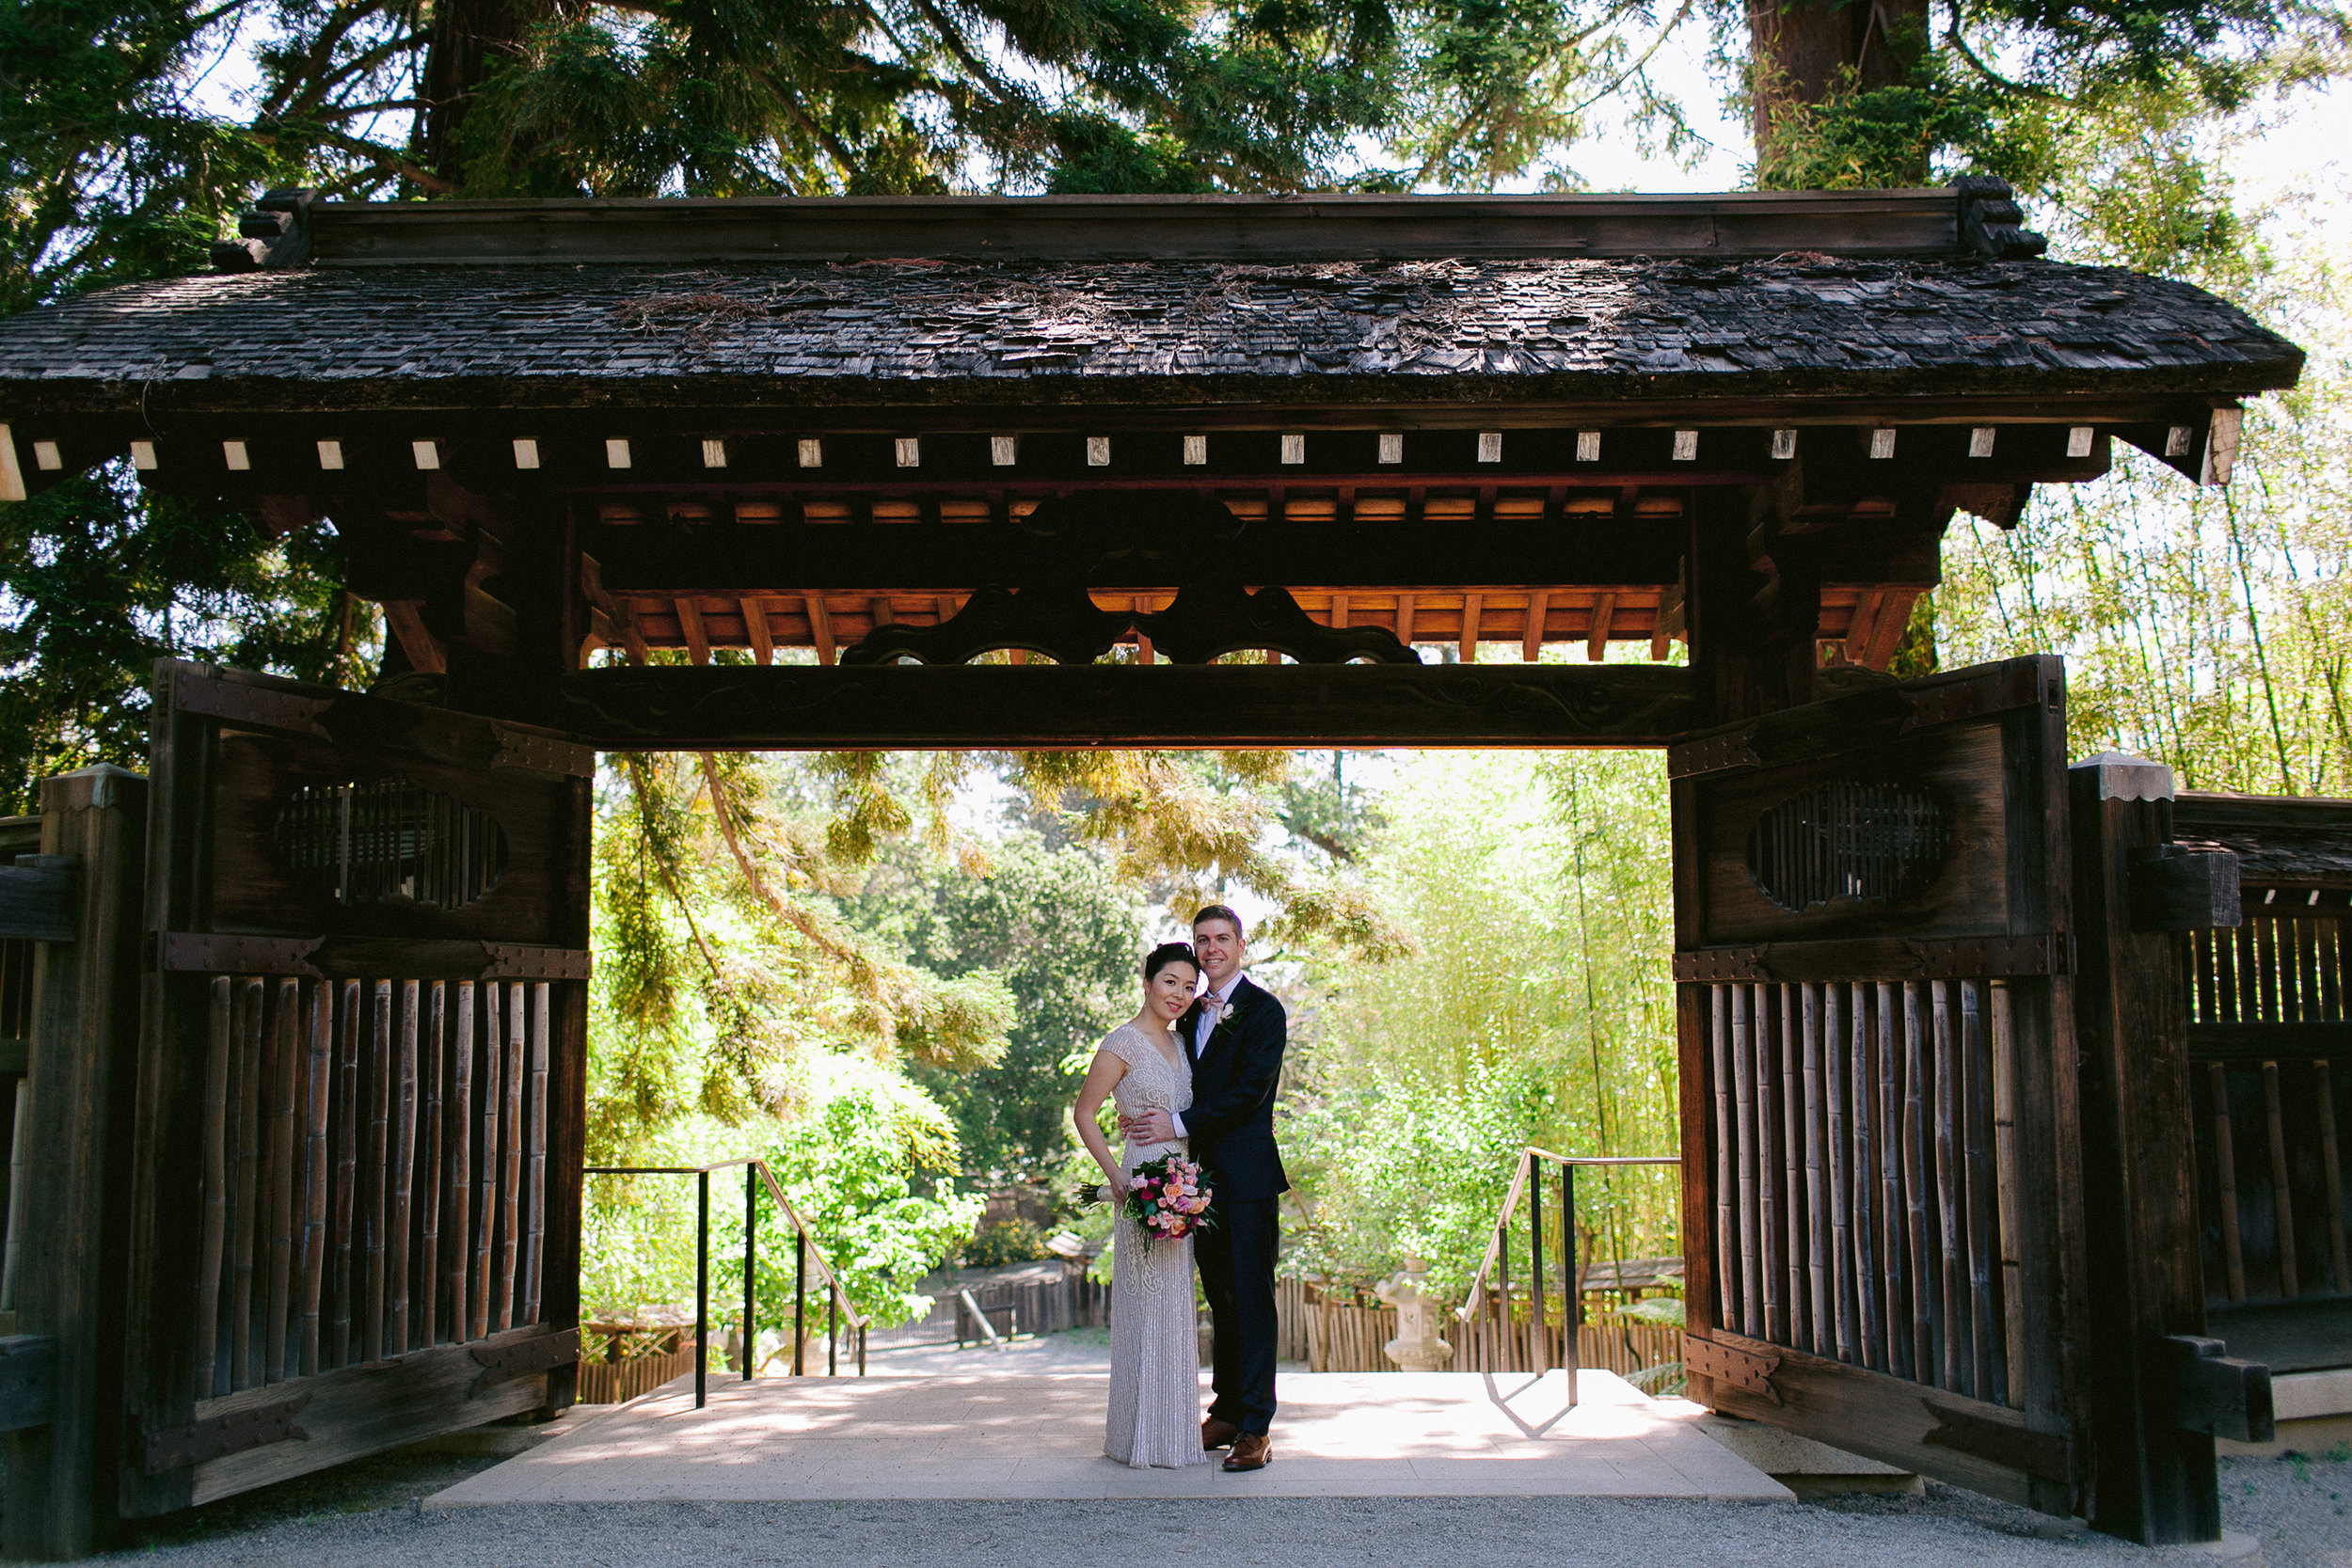 Hakone_Estate_and_Gardens_Wedding_011.jpg